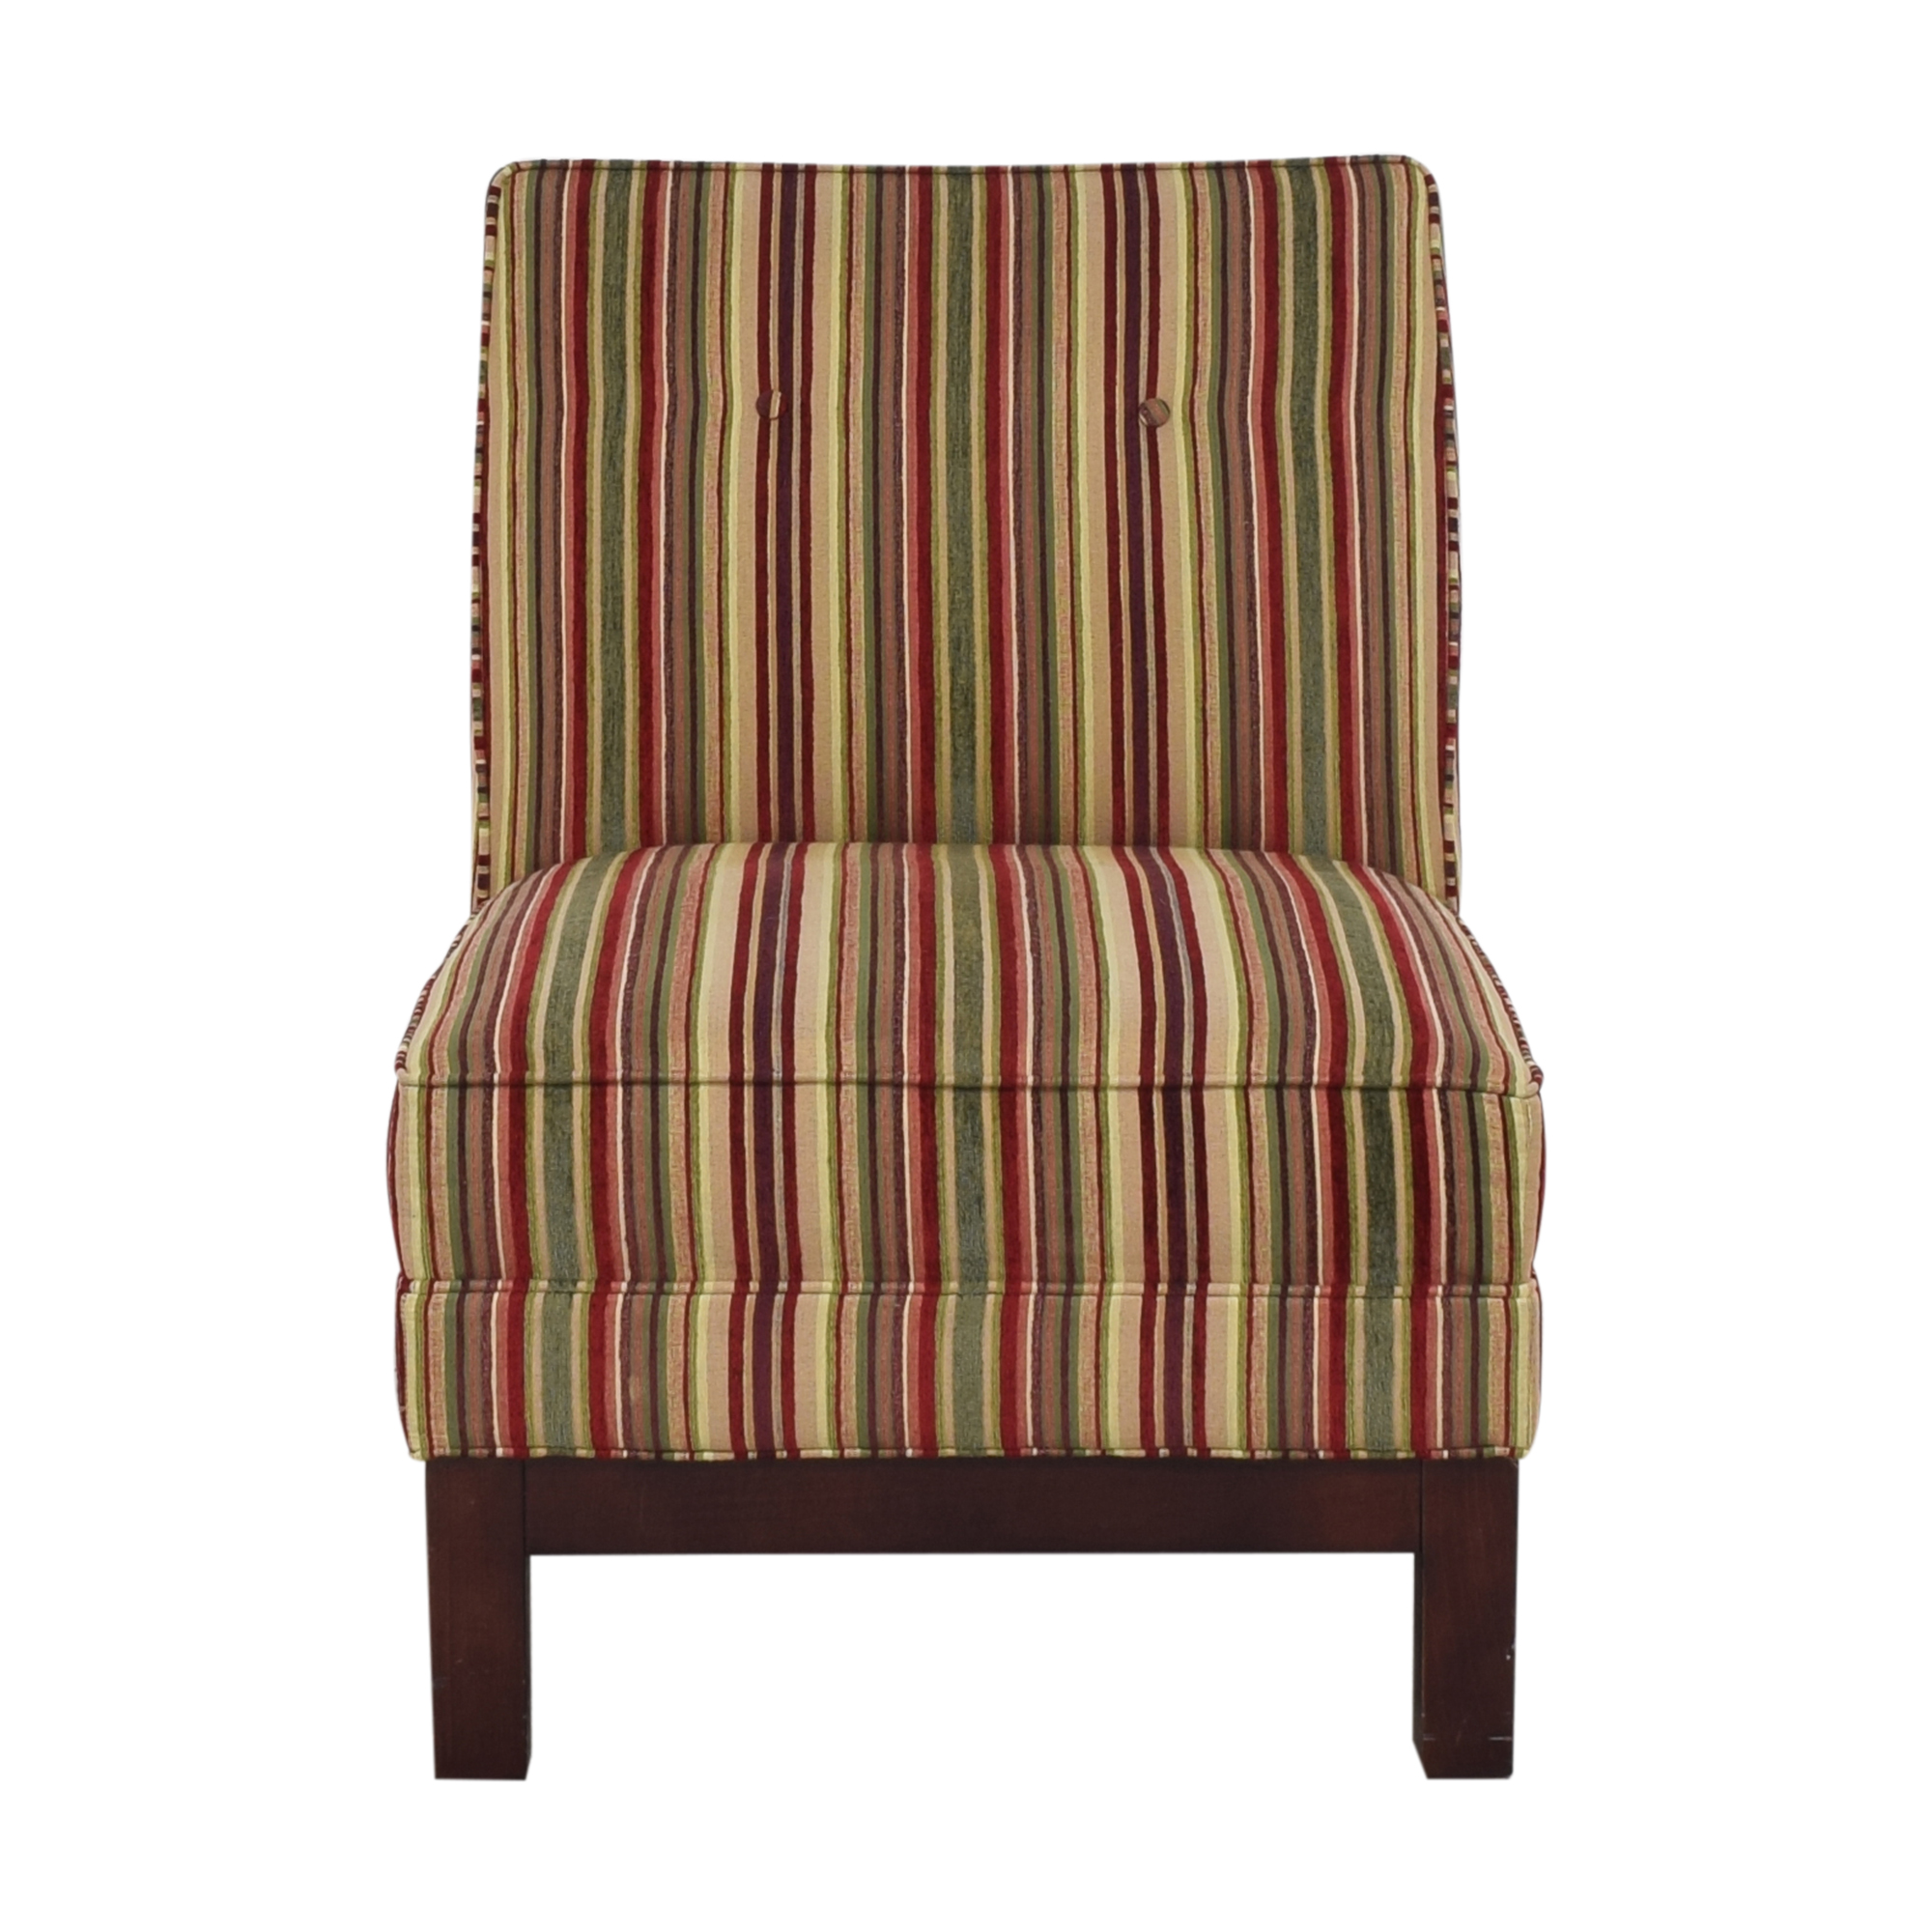 Mitchell Gold + Bob Williams Mitchell Gold + Bob Williams Slipper Chair ct